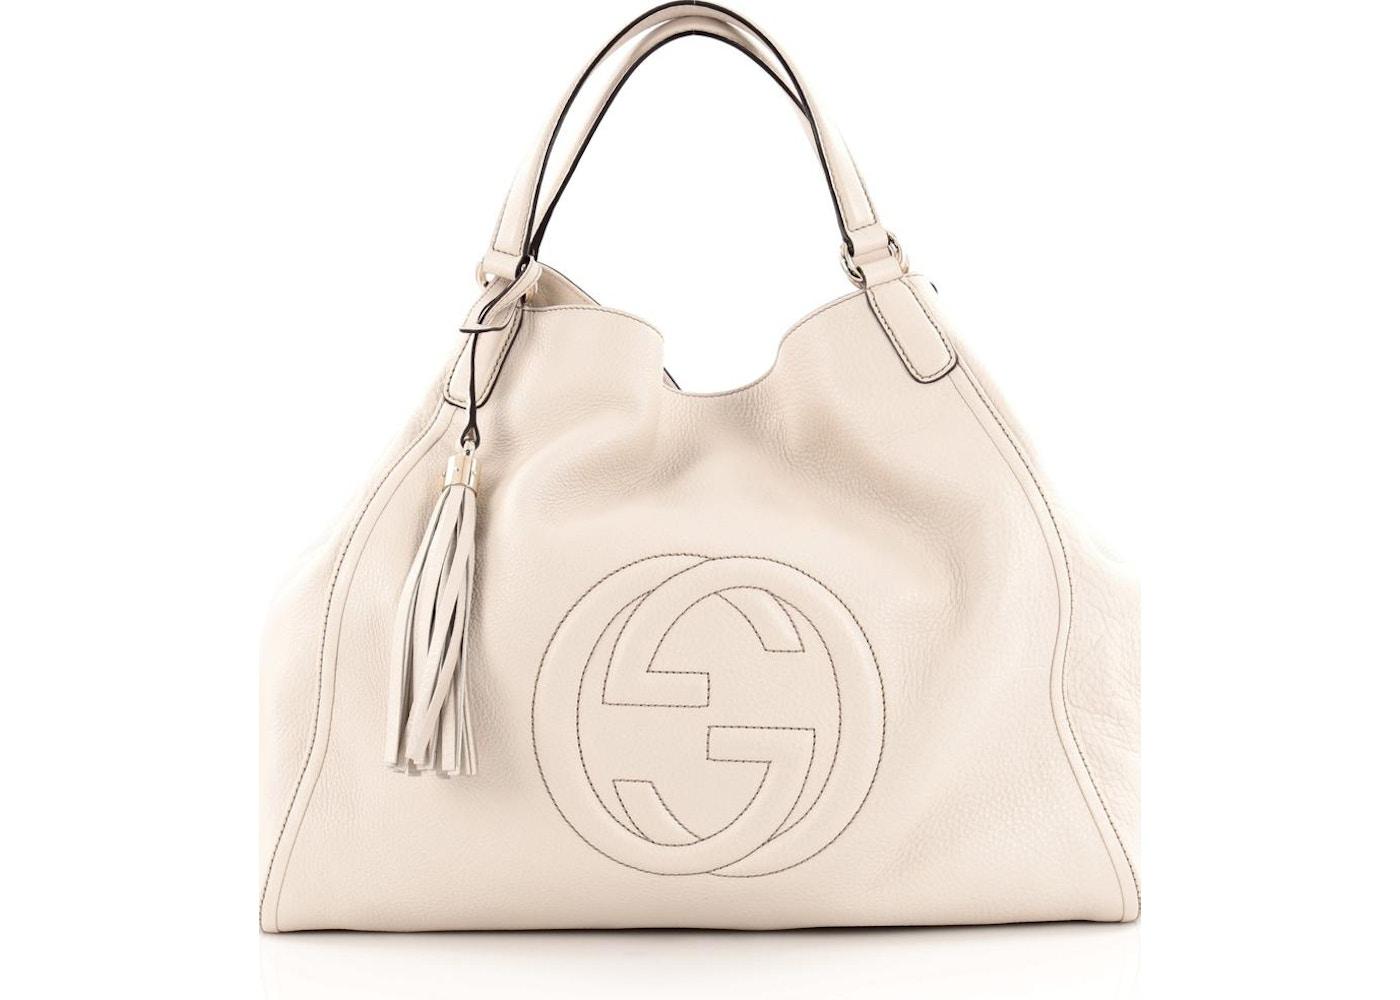 d0dc9546cb3412 Gucci Soho Shoulder Bag GG Interlocking GG Logo Stitched Large Off ...